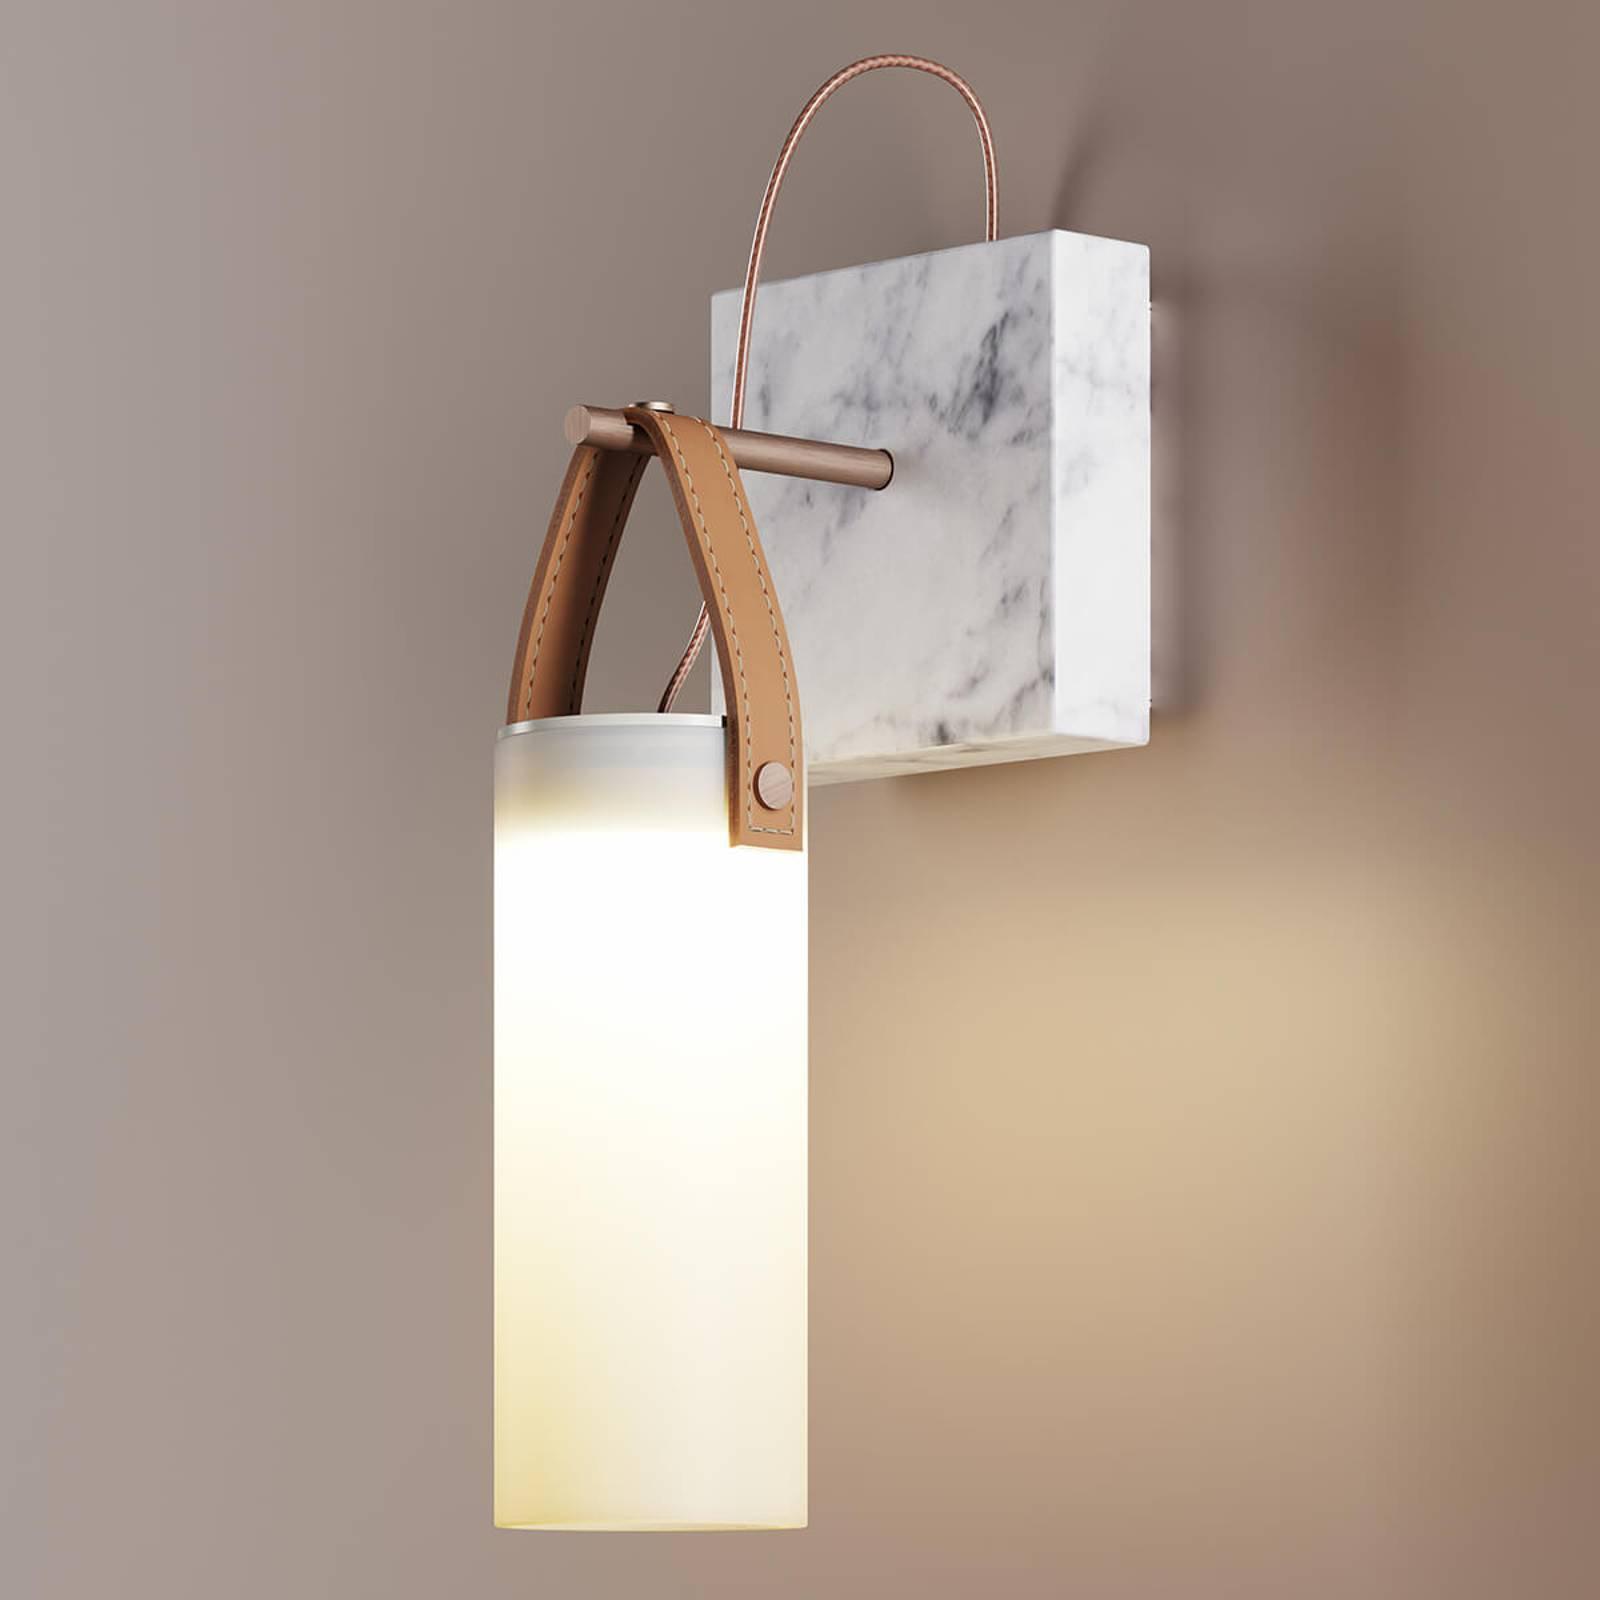 Designer vegglampe Galerie med LED